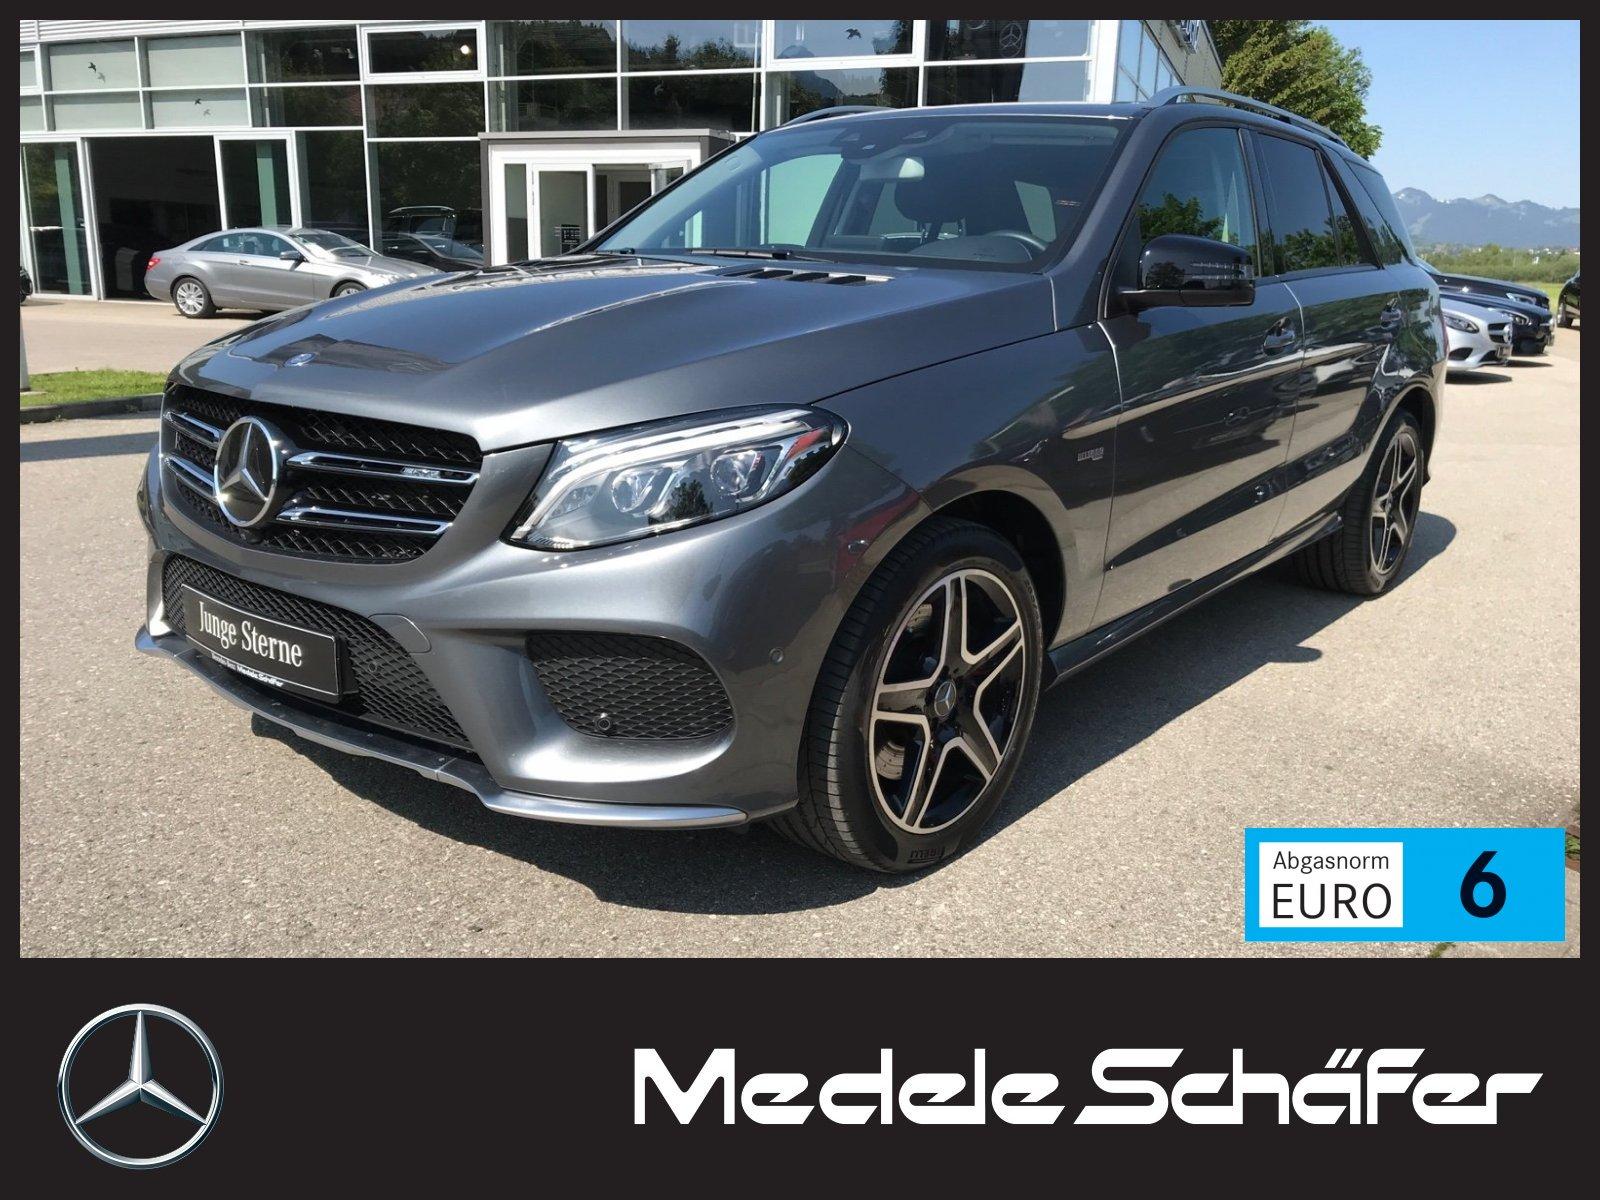 Mercedes-Benz GLE 43 AMG 4M Air Dist Com AHK Memo 360 Sitzklim, Jahr 2017, petrol